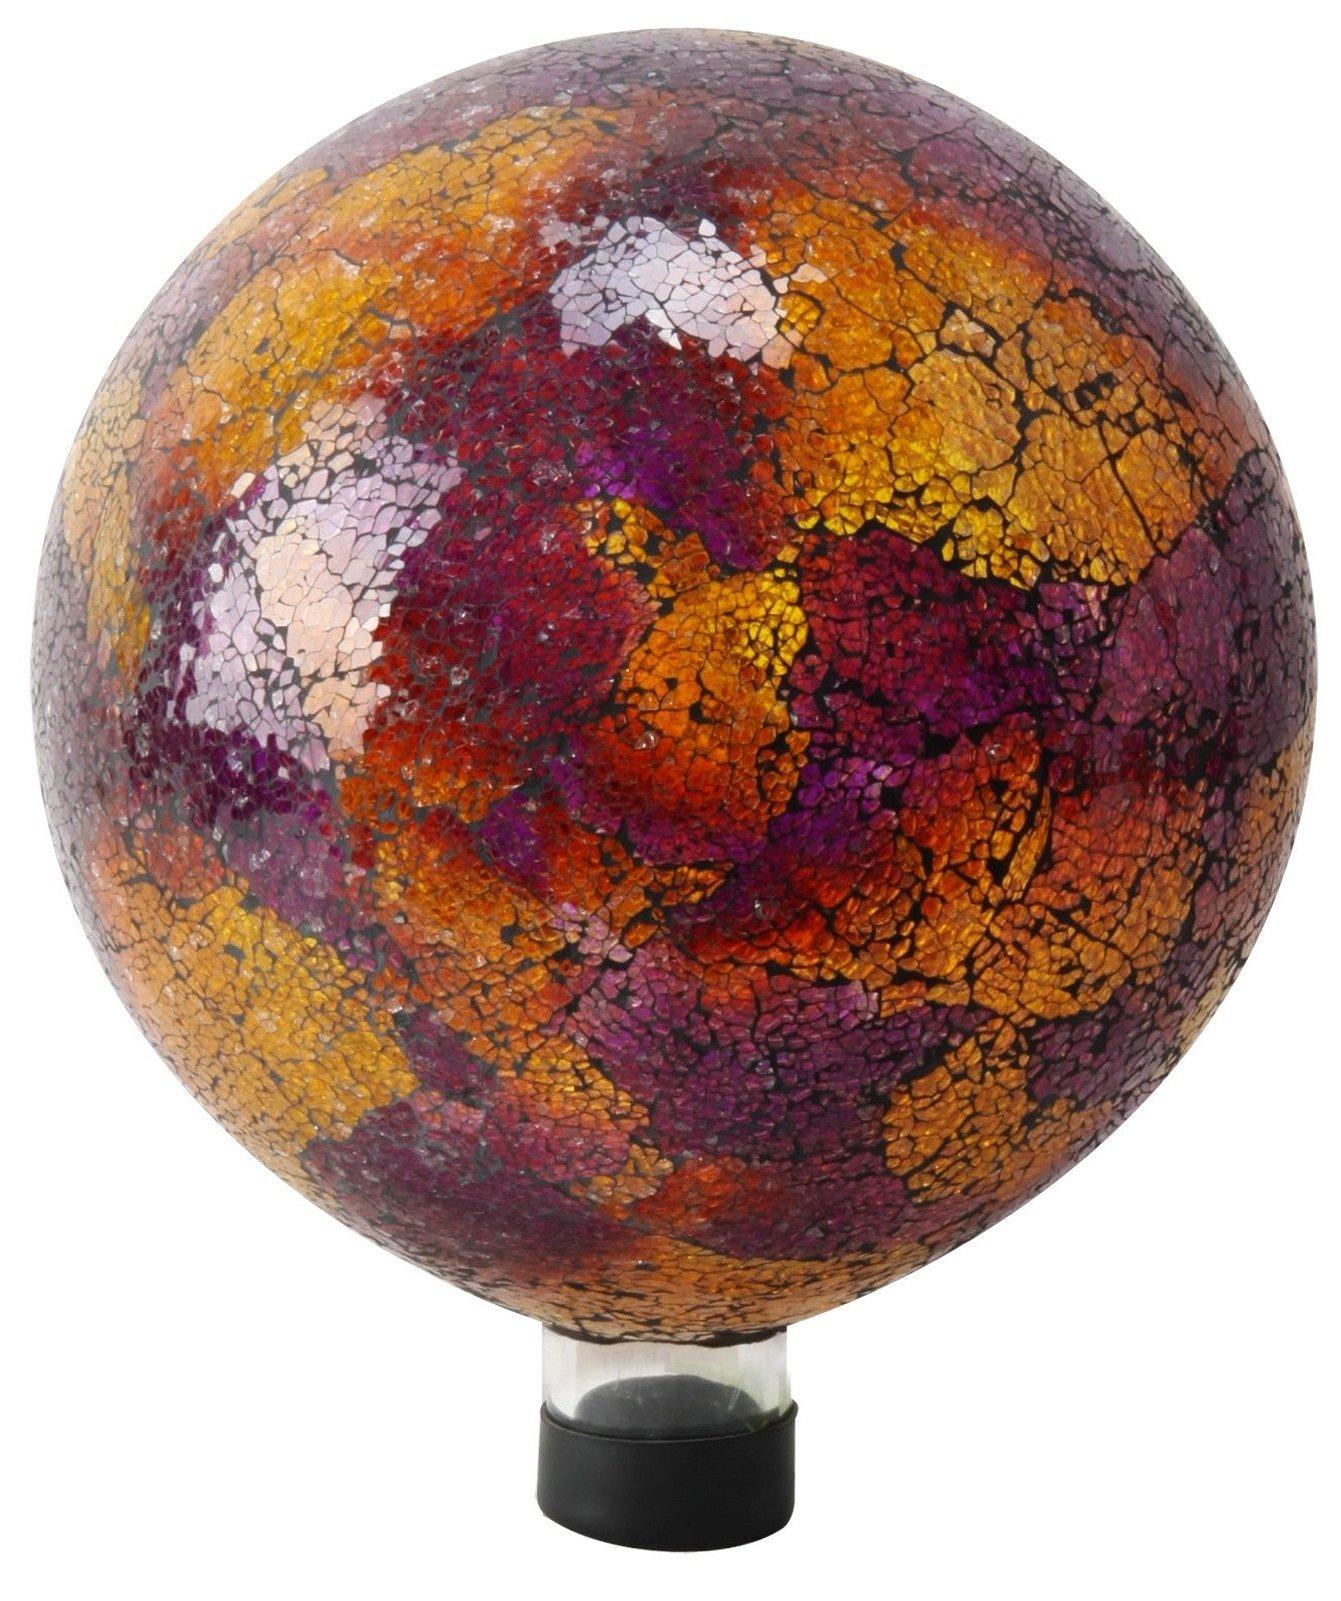 Alpine Mosaic Gazing Globe, 10-Inch, Pink/Yellow with Red